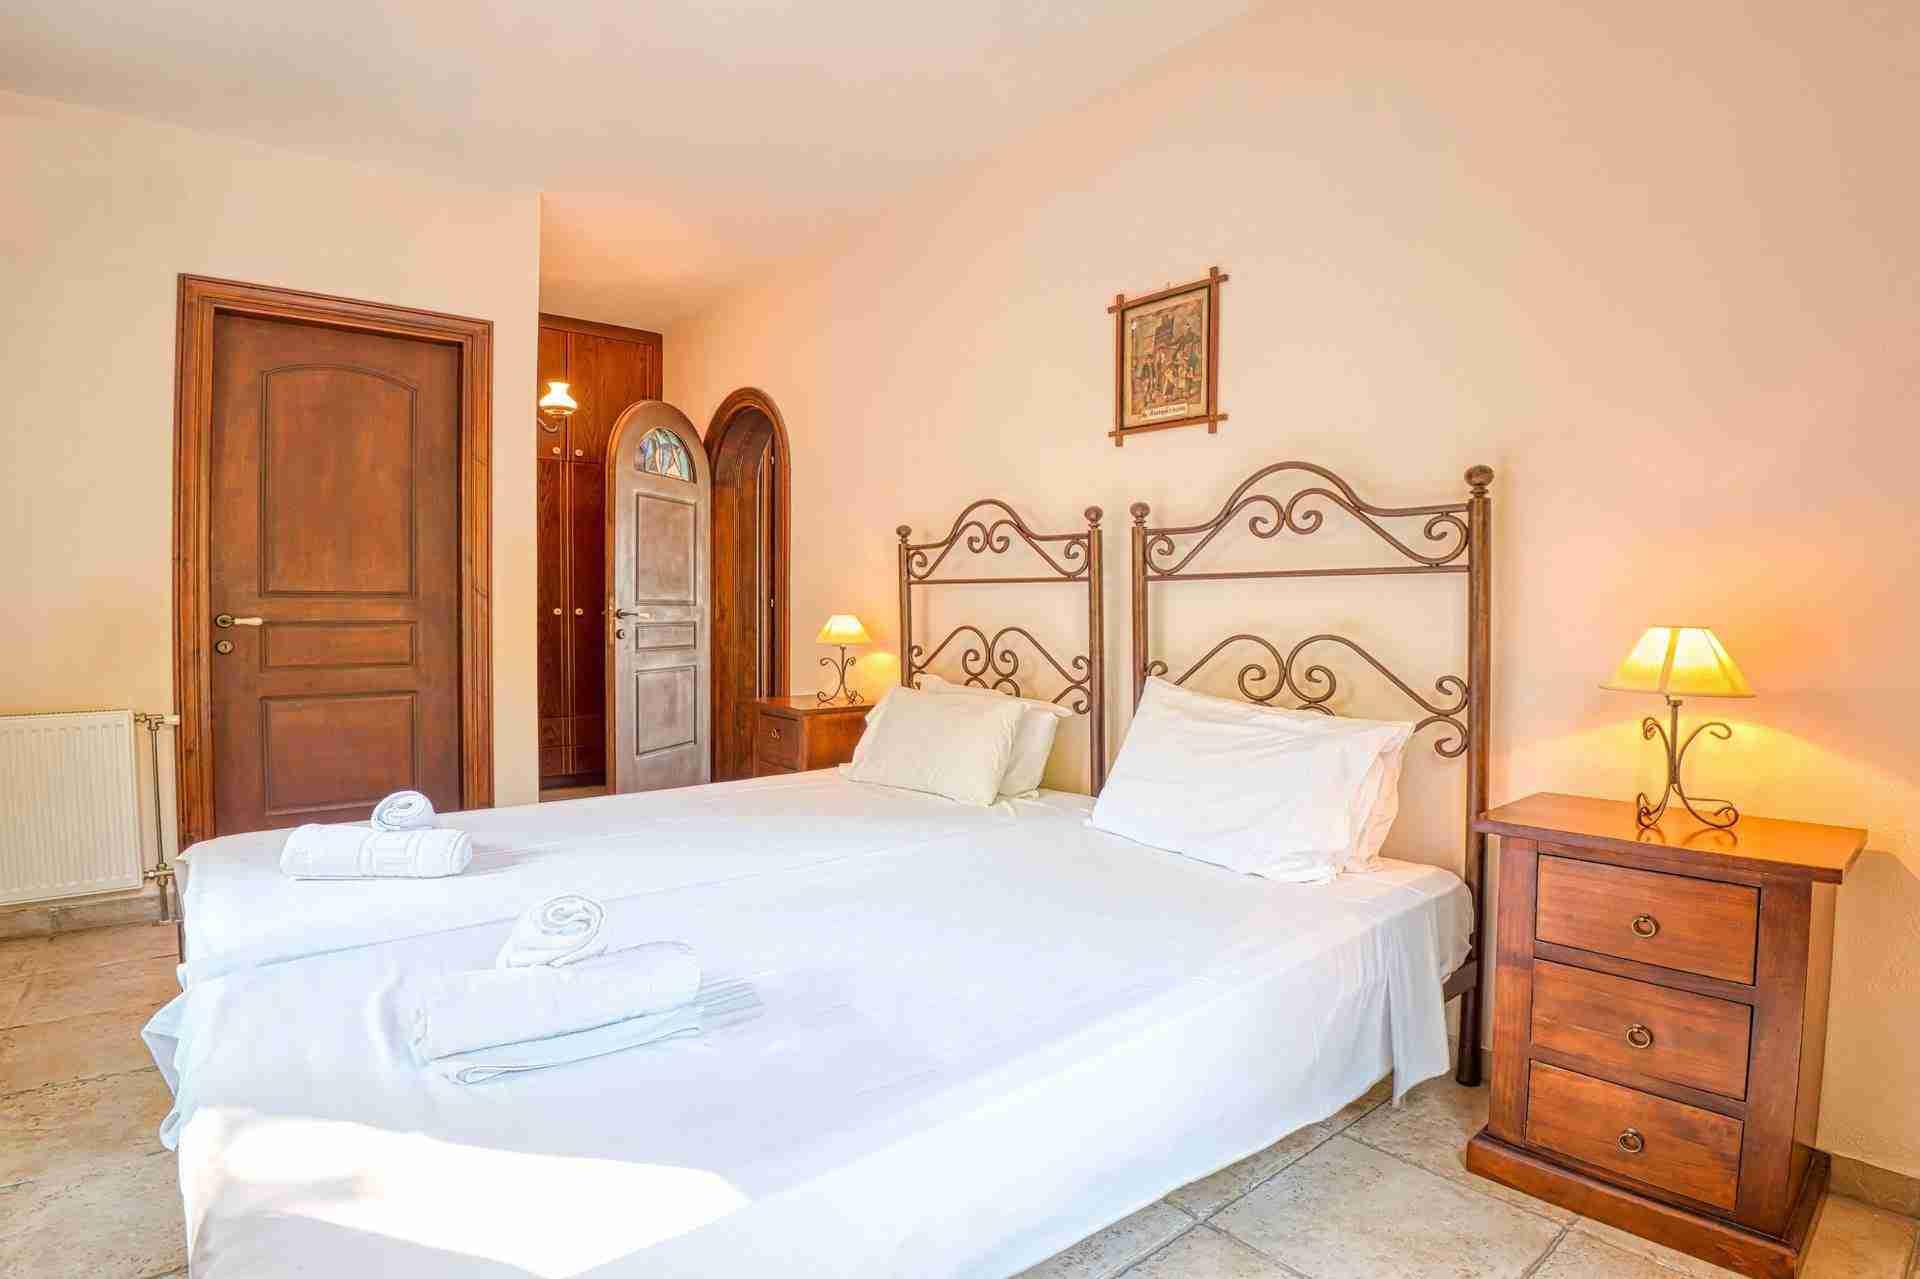 14 Febe twin bedroom